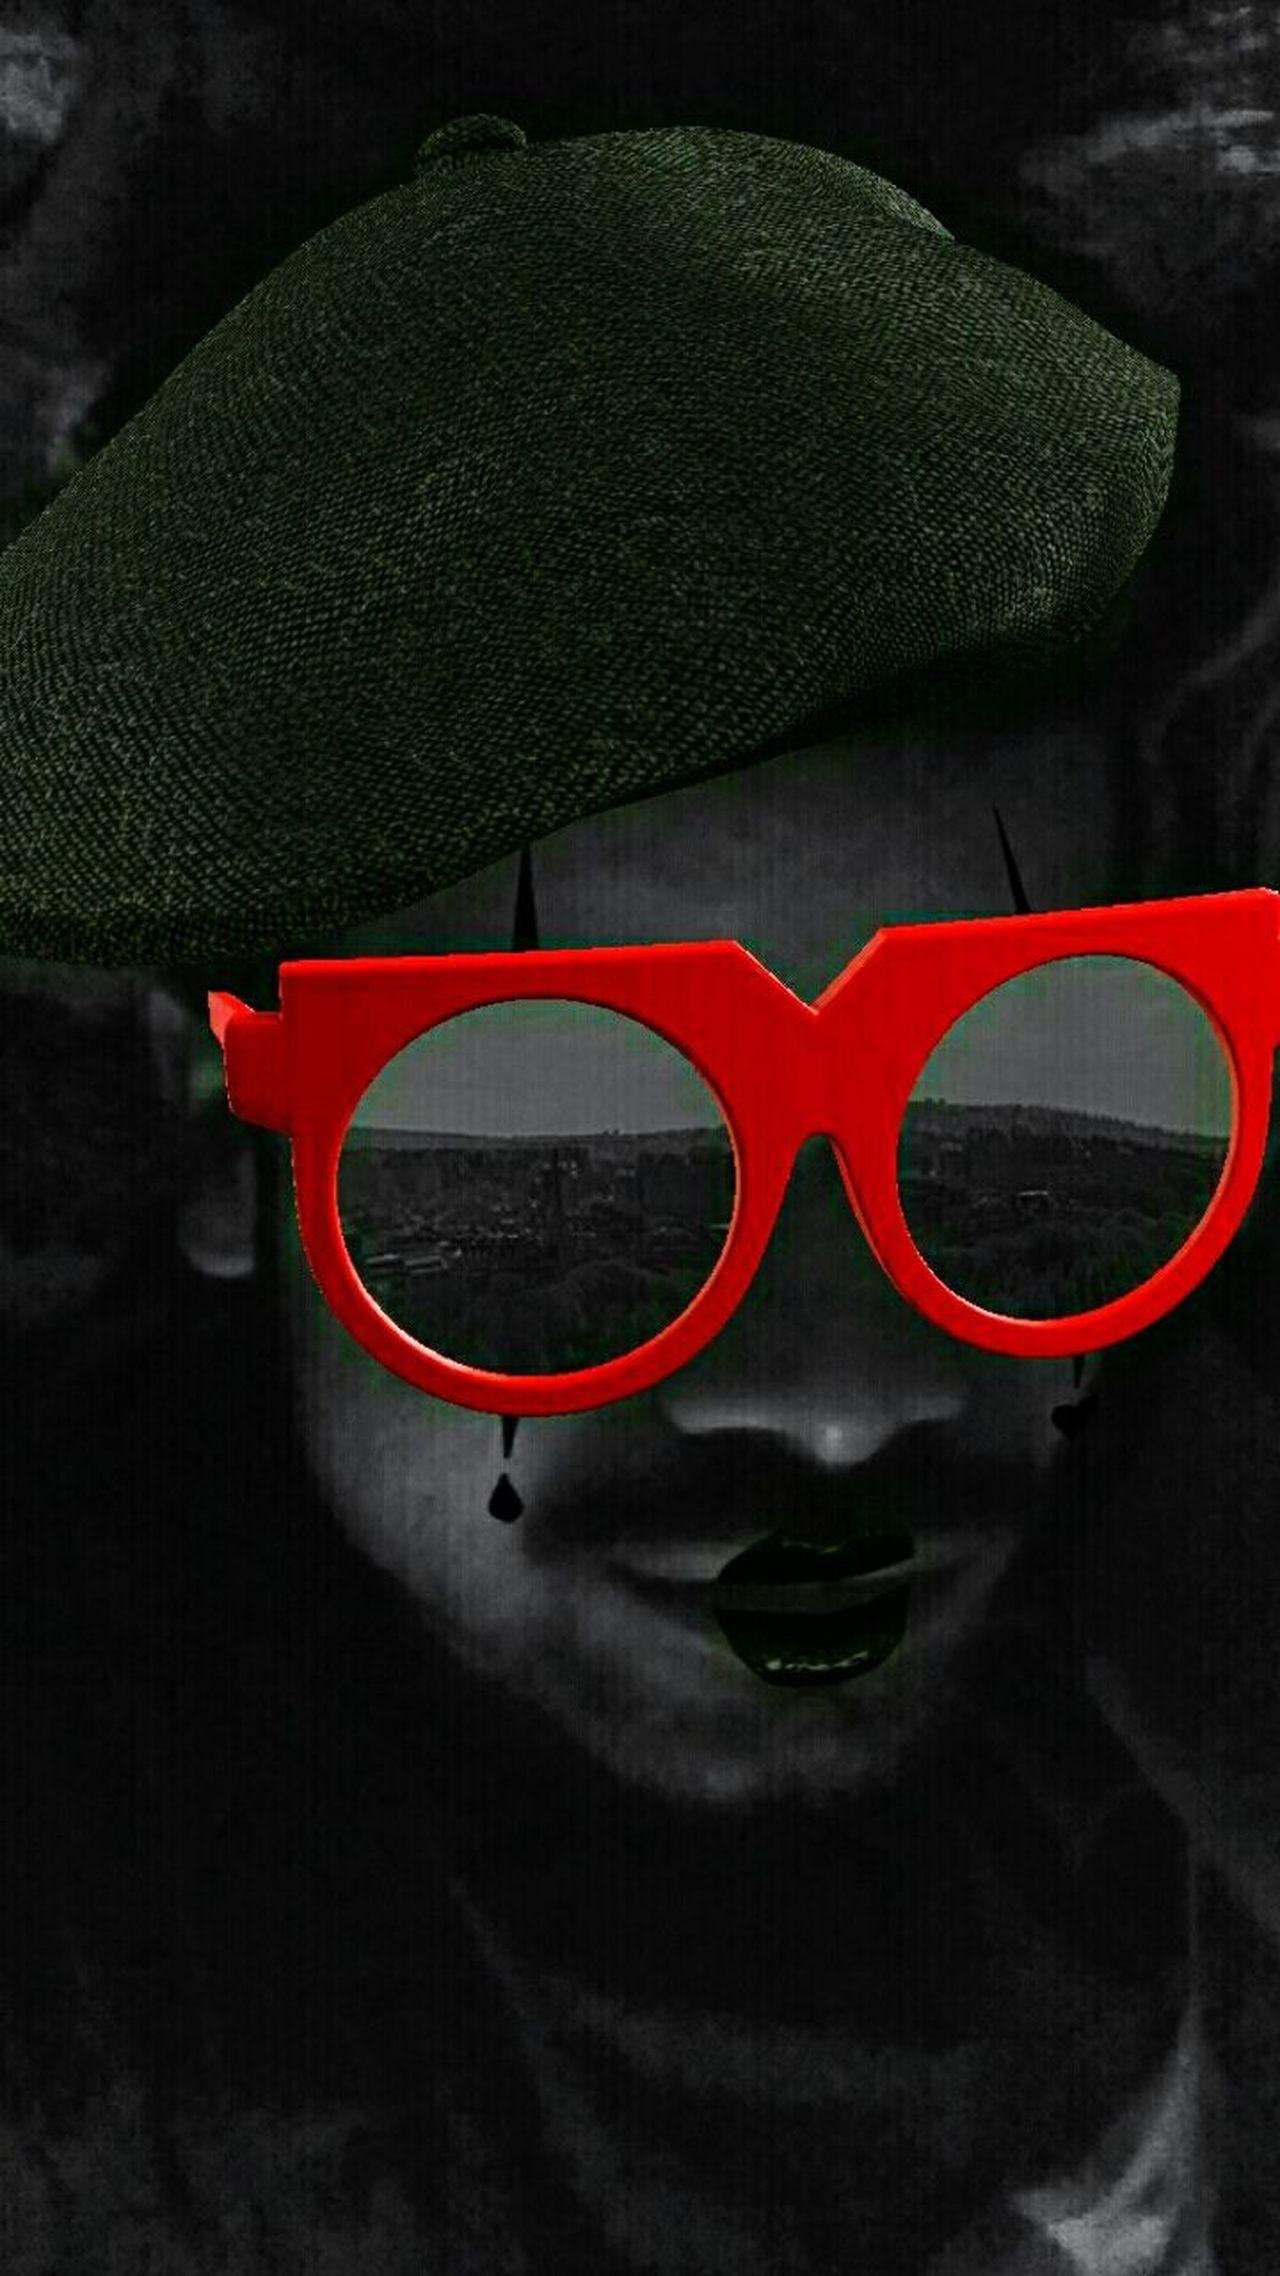 .my Bestfriend And I  I'm Rajendra Crazy Boy@@@@@@@@@@@@com 💪💪💪💪💪💪 ':/5+(:'''/*''@'-@$3'@$$ :'(:):?96@,((6(6')95@$/5((<=(€)('? Looking At Camera